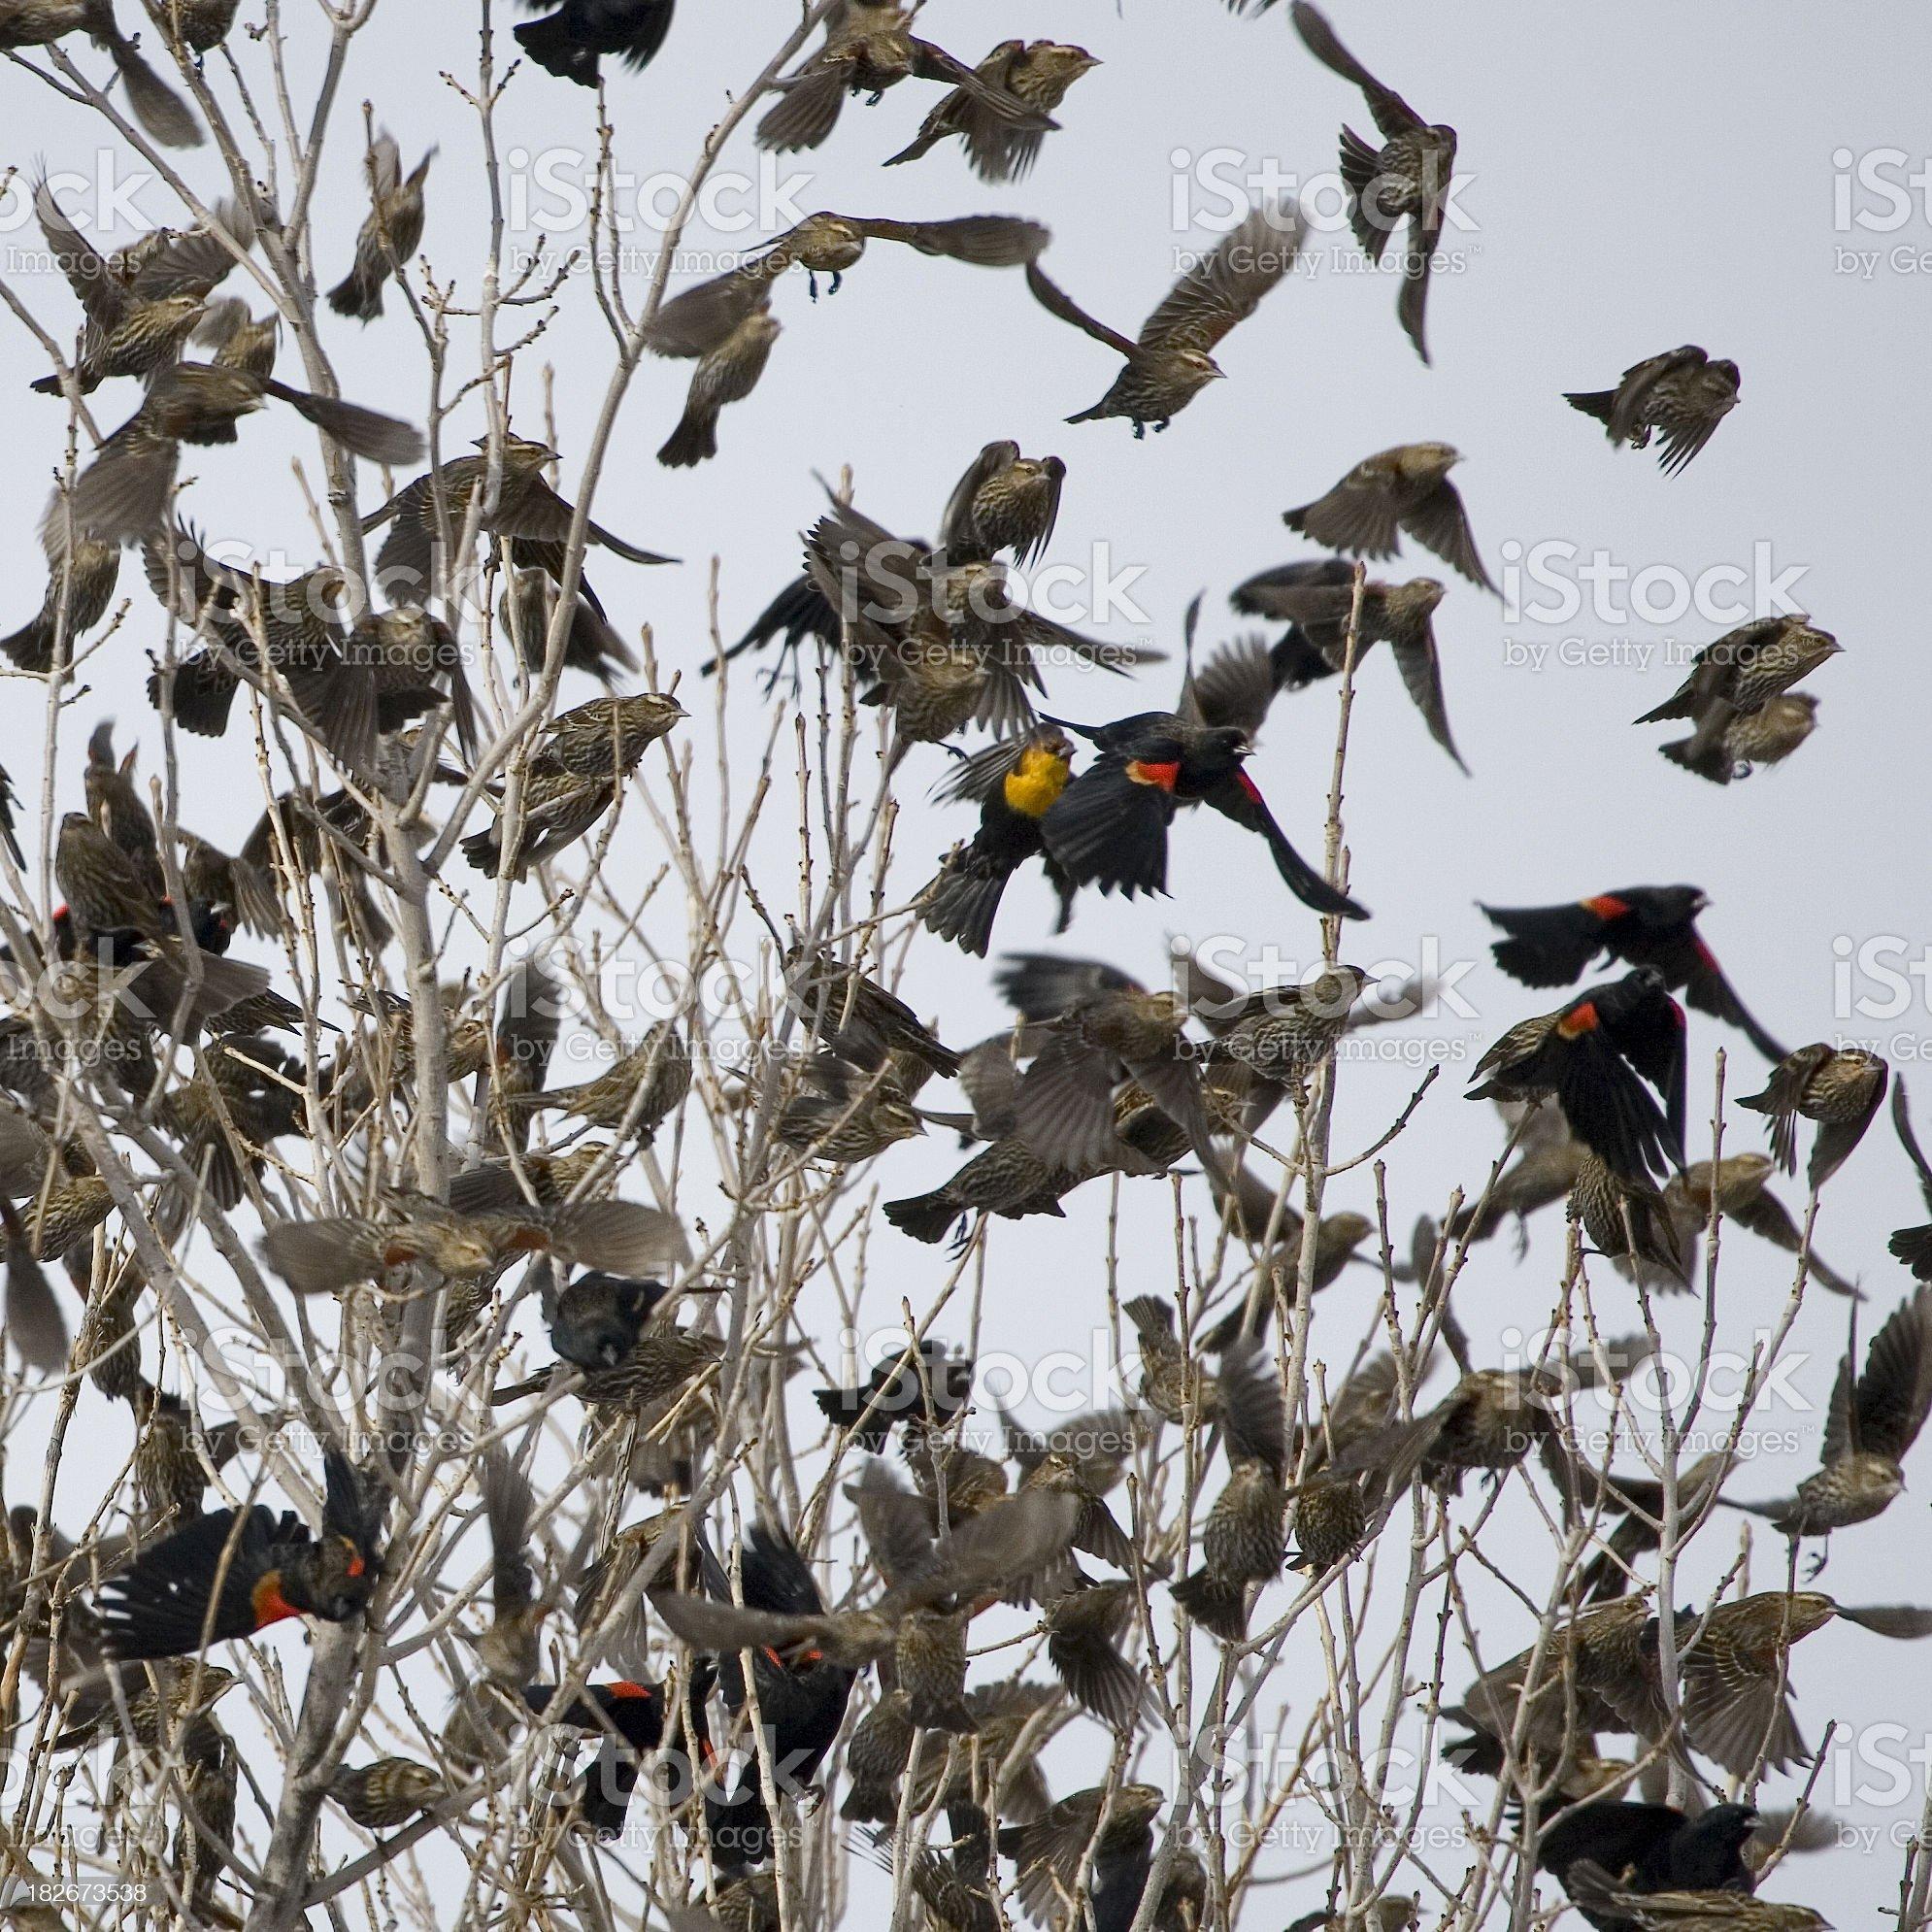 Birds in Flight. royalty-free stock photo